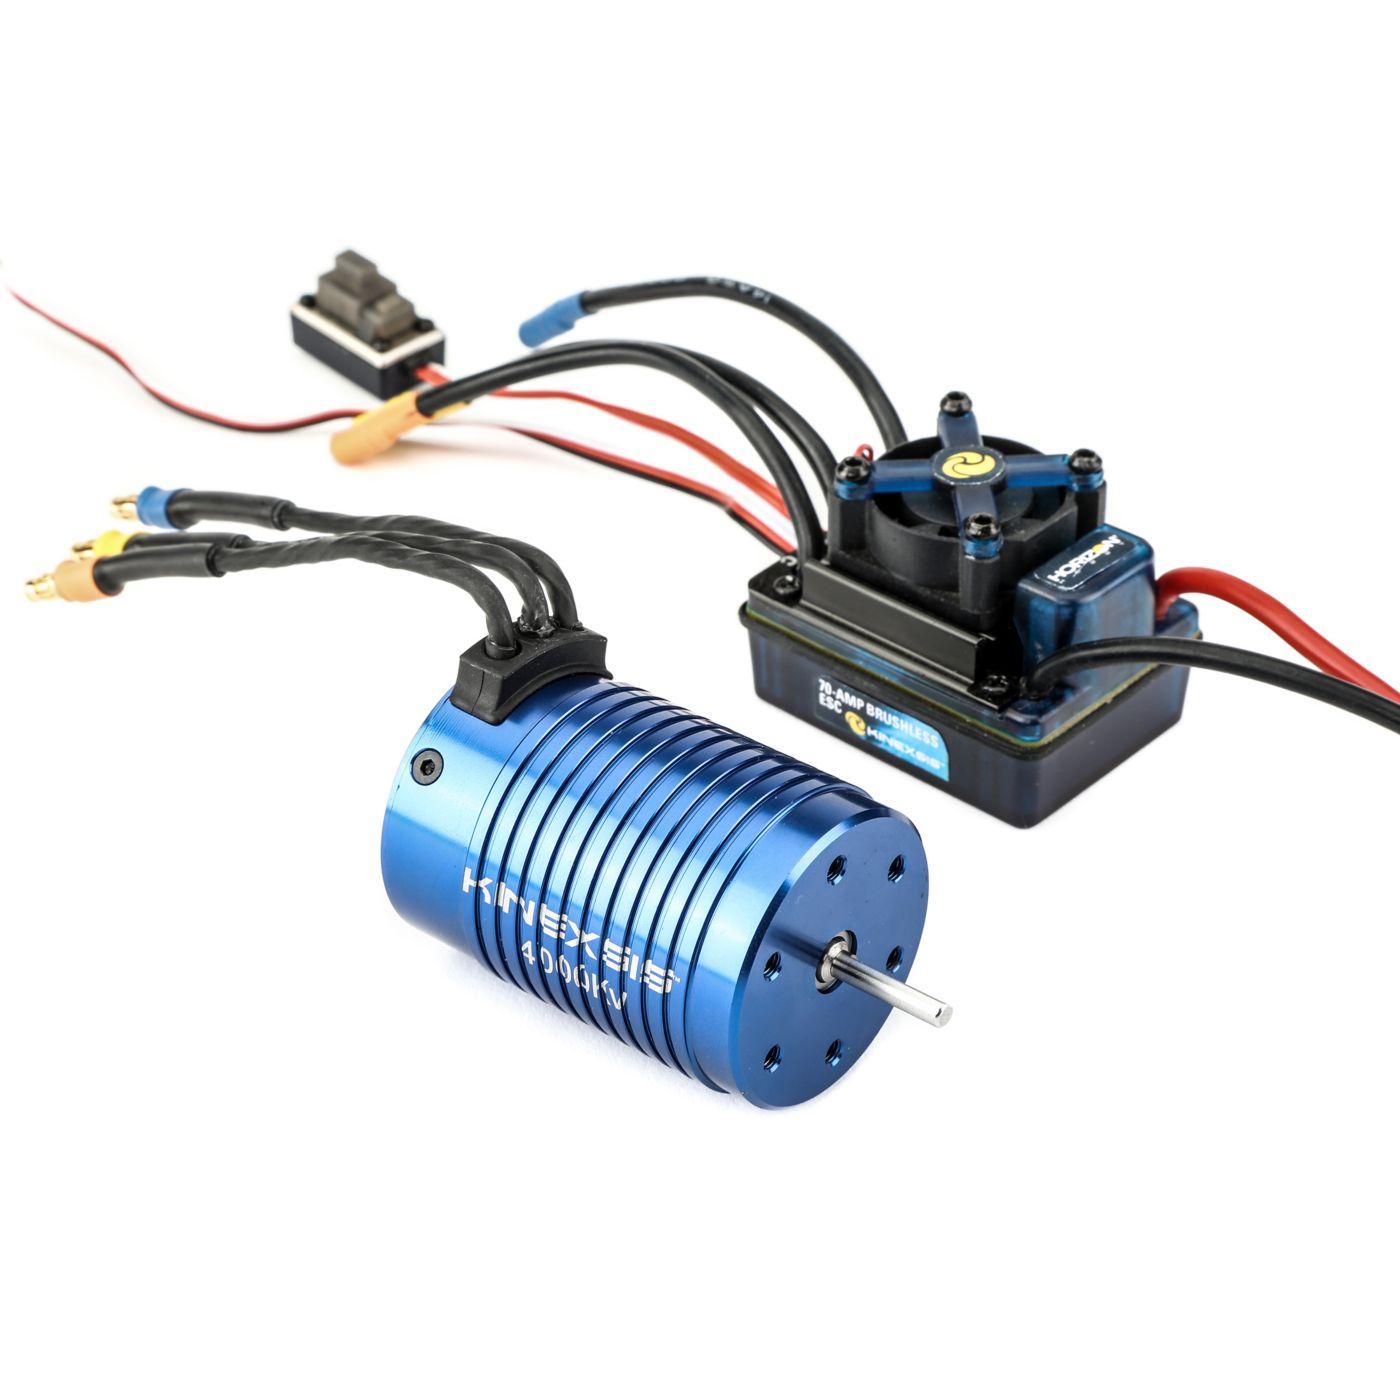 hight resolution of 1 10 4 pole 4000kv esc motor combo horizonhobby north american edition electrical wiring harness with eicv escv